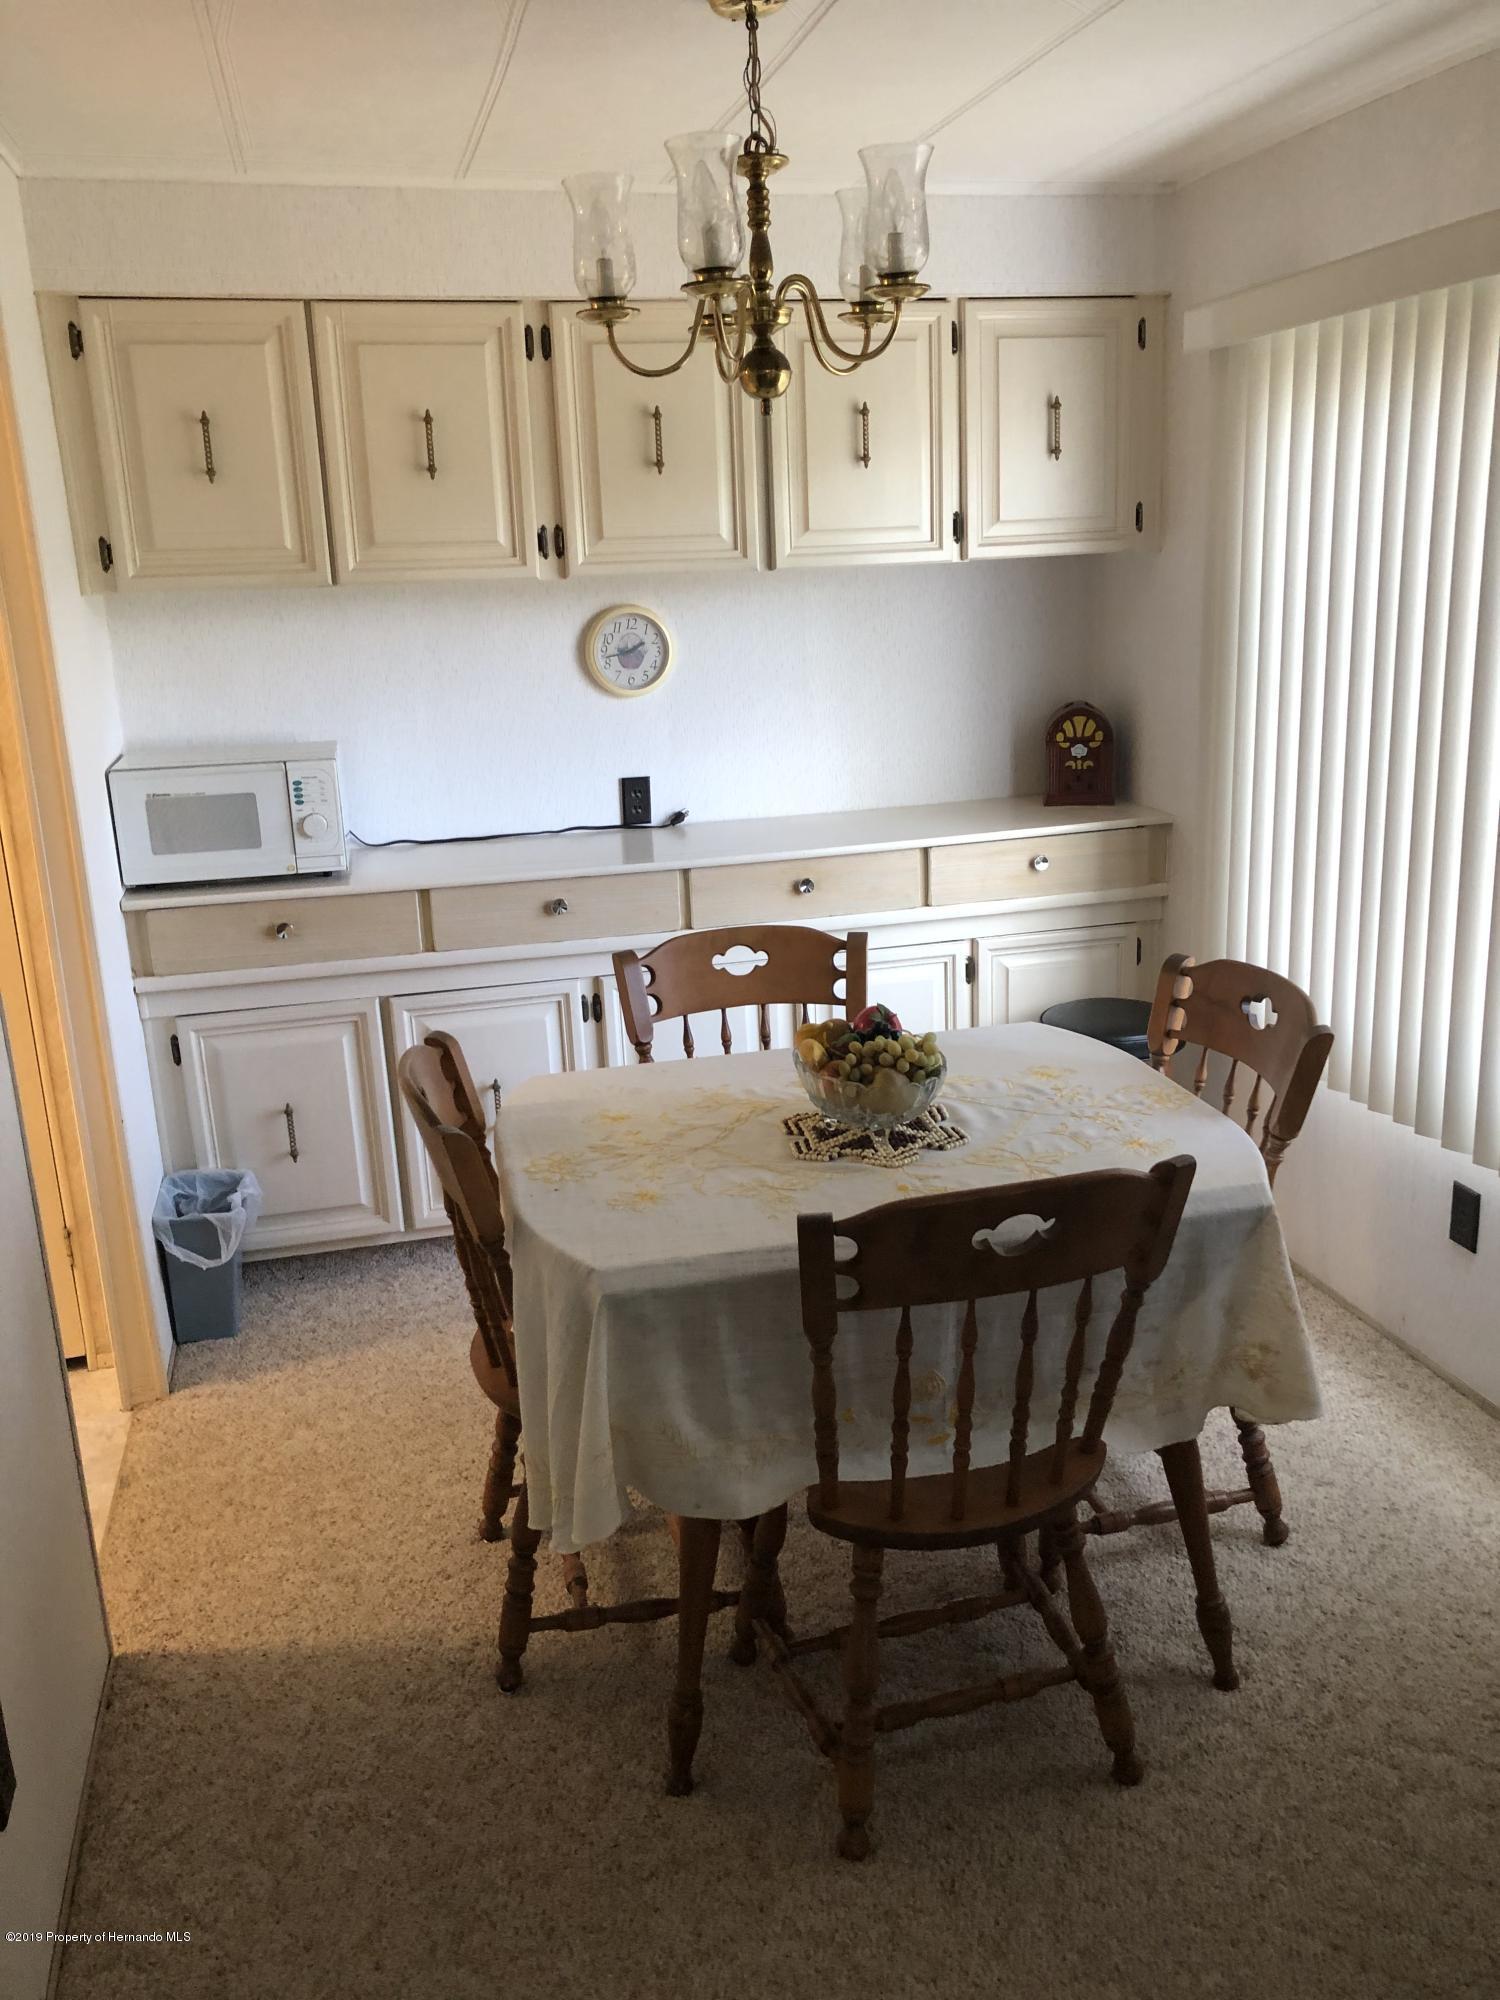 29160 Glenwood Street, Brooksville, Florida 34602, 2 Bedrooms Bedrooms, ,2 BathroomsBathrooms,Residential,For Sale,Glenwood,2206068